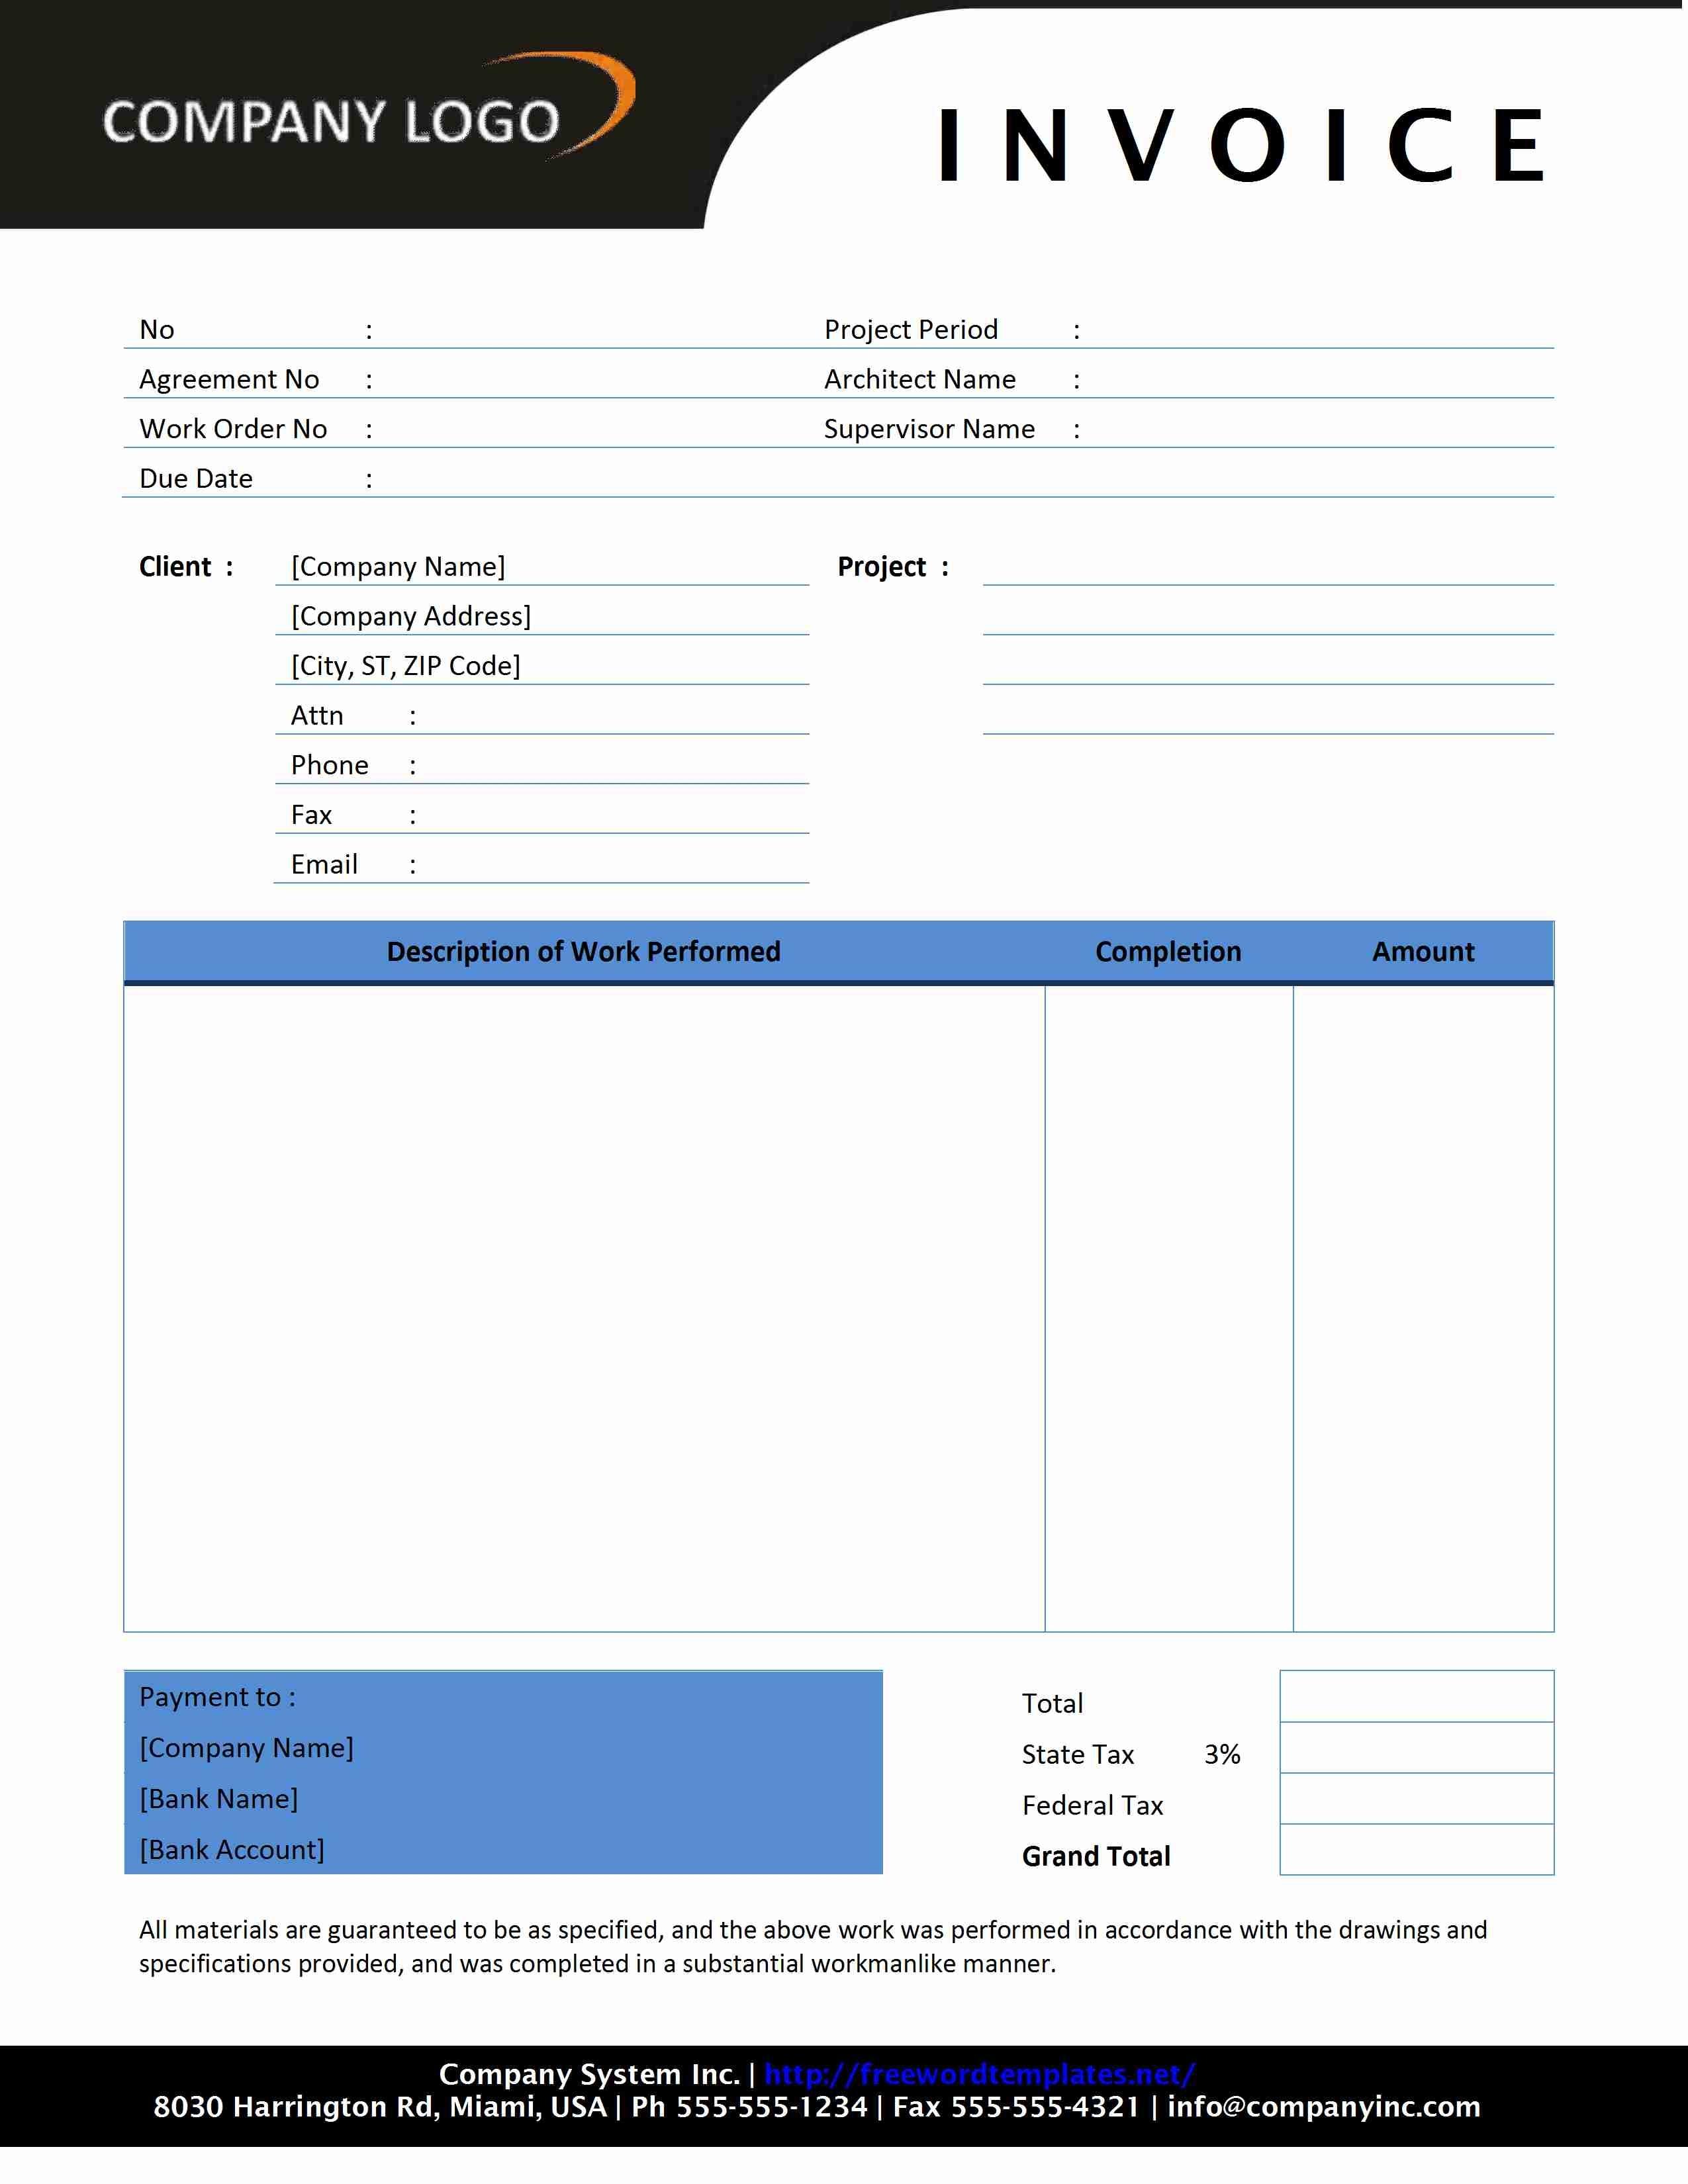 invoice google docs google docs templates invoice invoice template free 2016 2550 X 3300